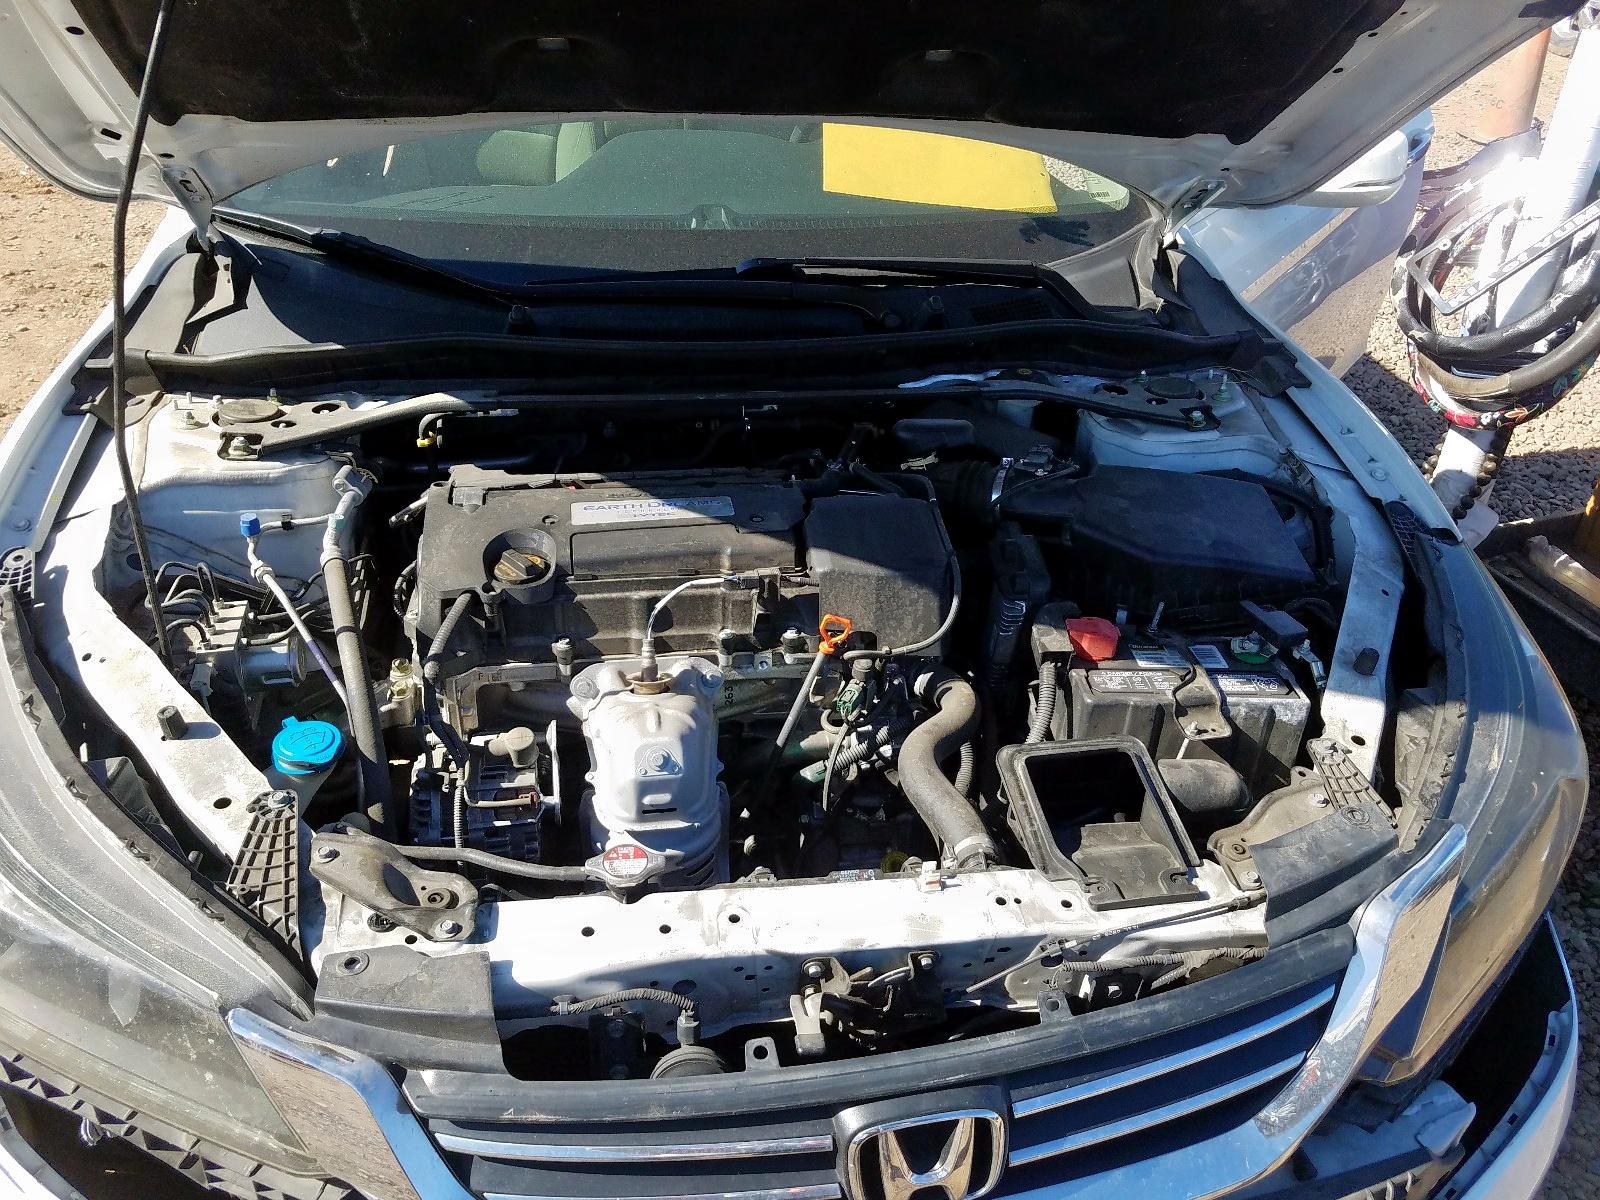 1HGCR2F75EA217906 - 2014 Honda Accord Ex 2.4L inside view